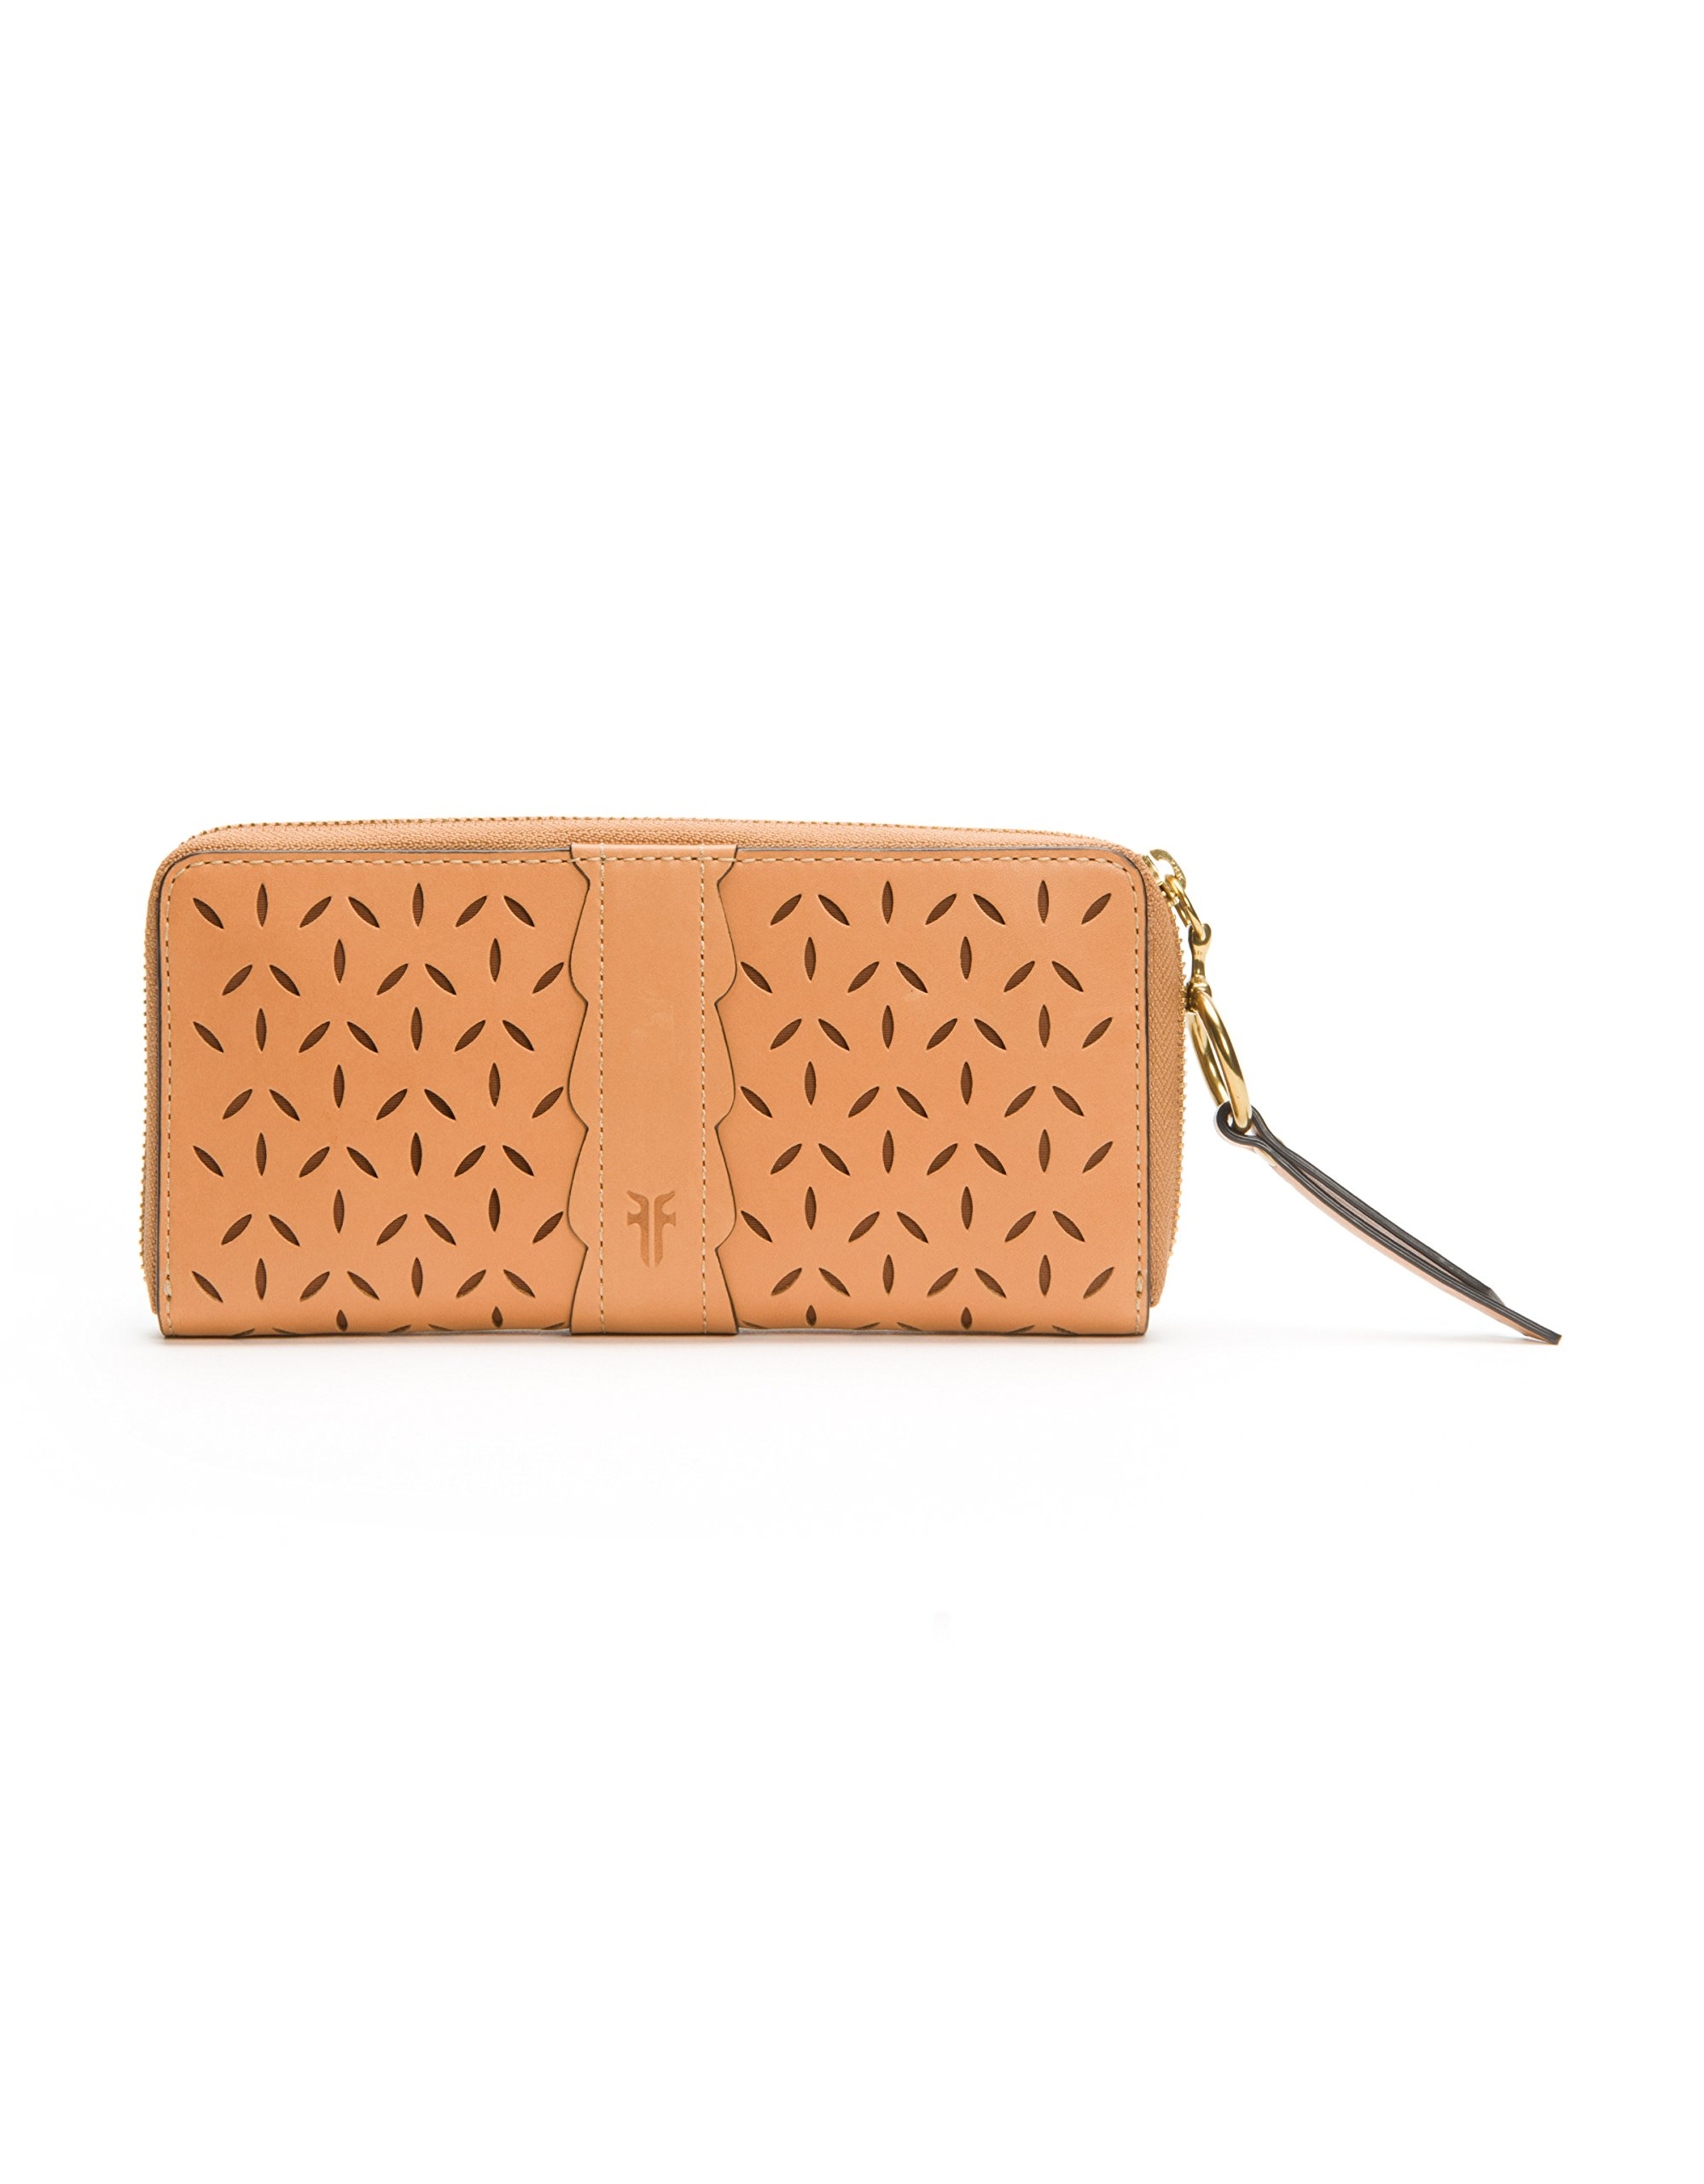 Ilana Perf Zip Around Wallet Oiled Veg Wallet, Light Tan, One Size by FRYE